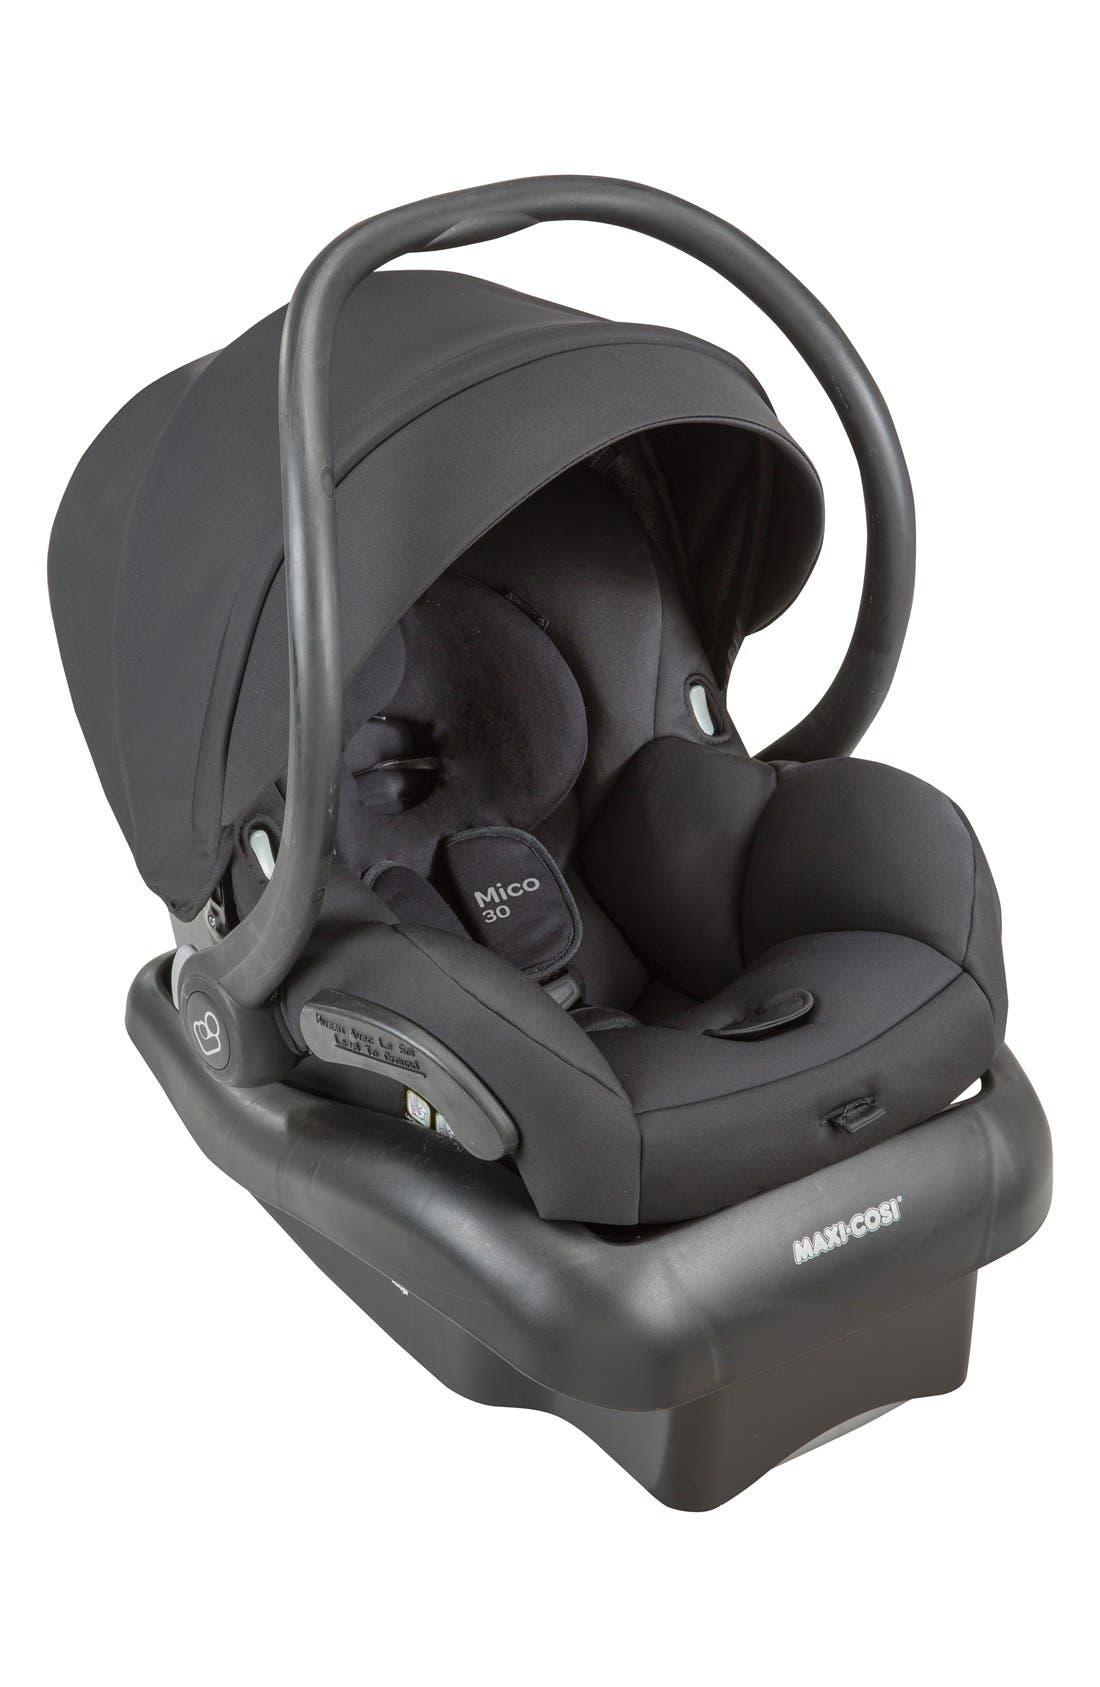 Alternate Image 1 Selected - Maxi-Cosi® 'Mico 30' Infant Car Seat